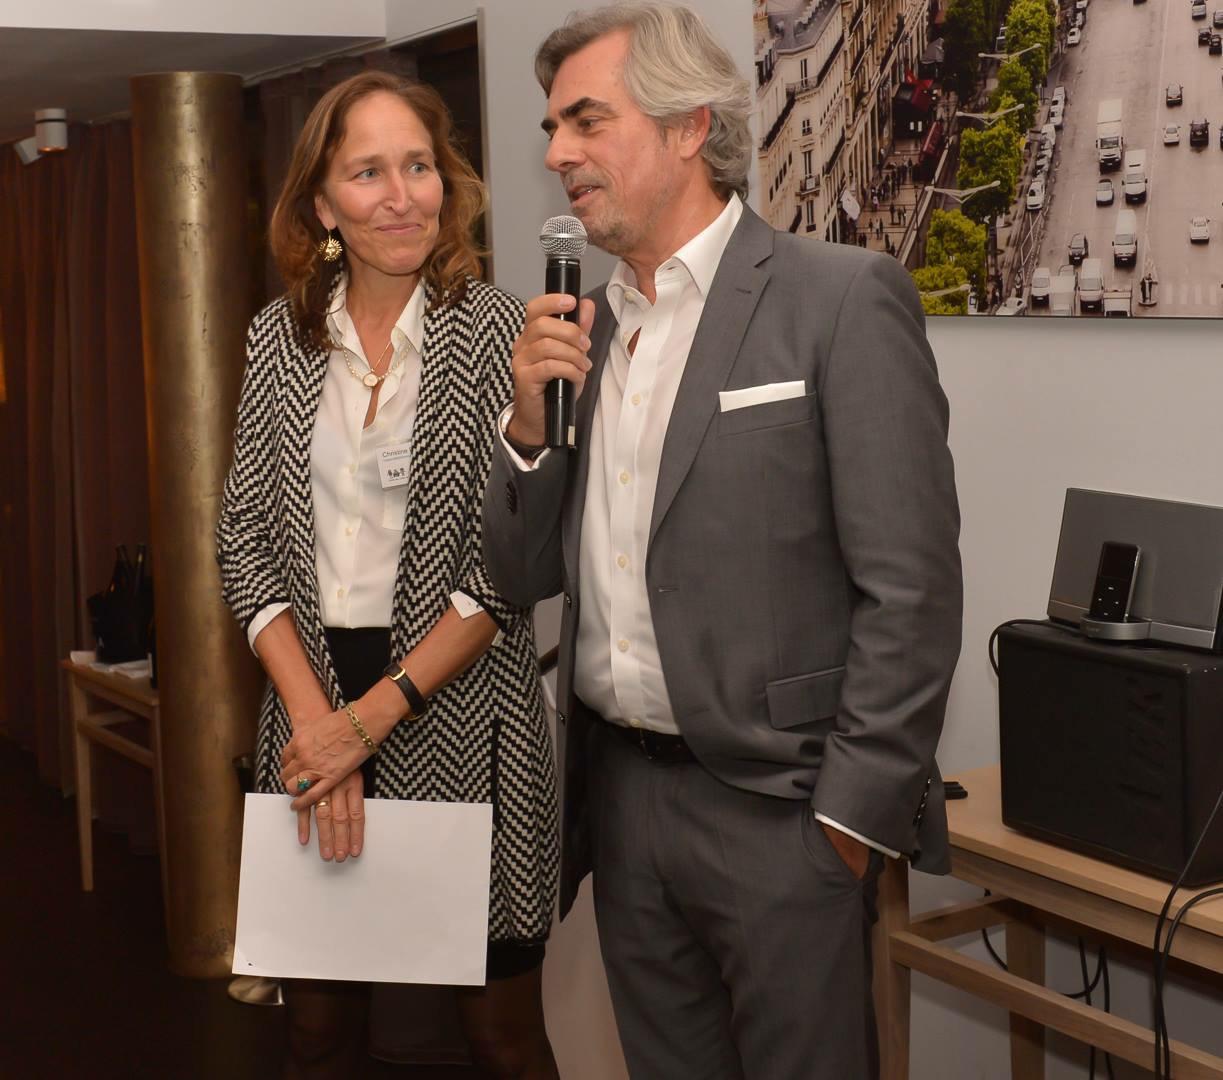 Thomas Koenen Stiftung Ambulantes Kinderhospiz München AKM